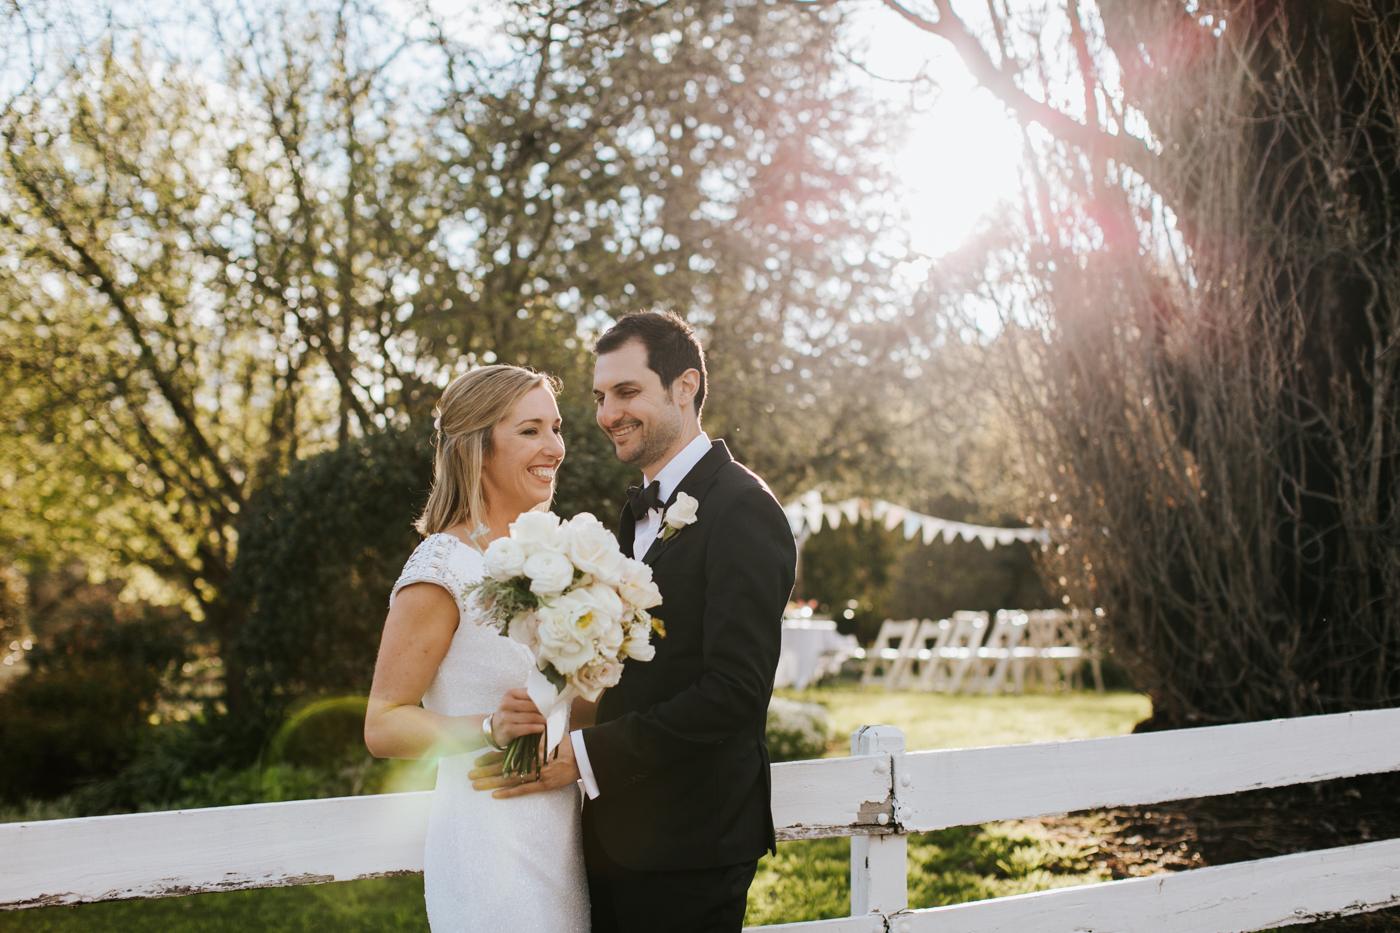 Bridget & James - Orange Country Wedding - Samantha Heather Photography-126.jpg